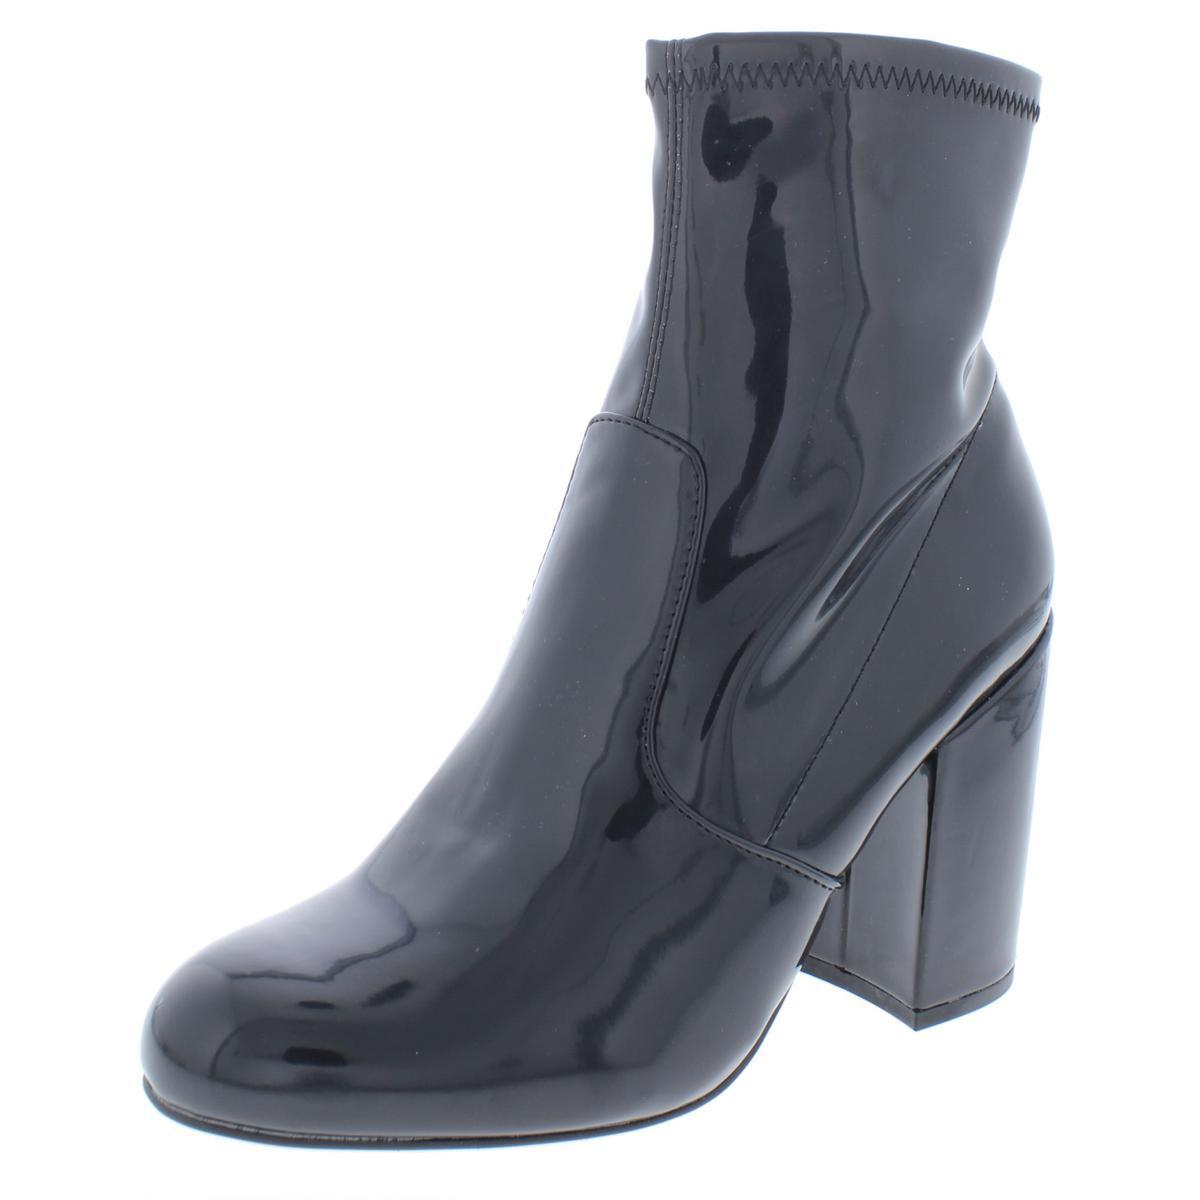 2904c9cb11f Details about Steve Madden Womens Gaze Black Patent Booties Shoes 5 Medium  (B,M) BHFO 9681